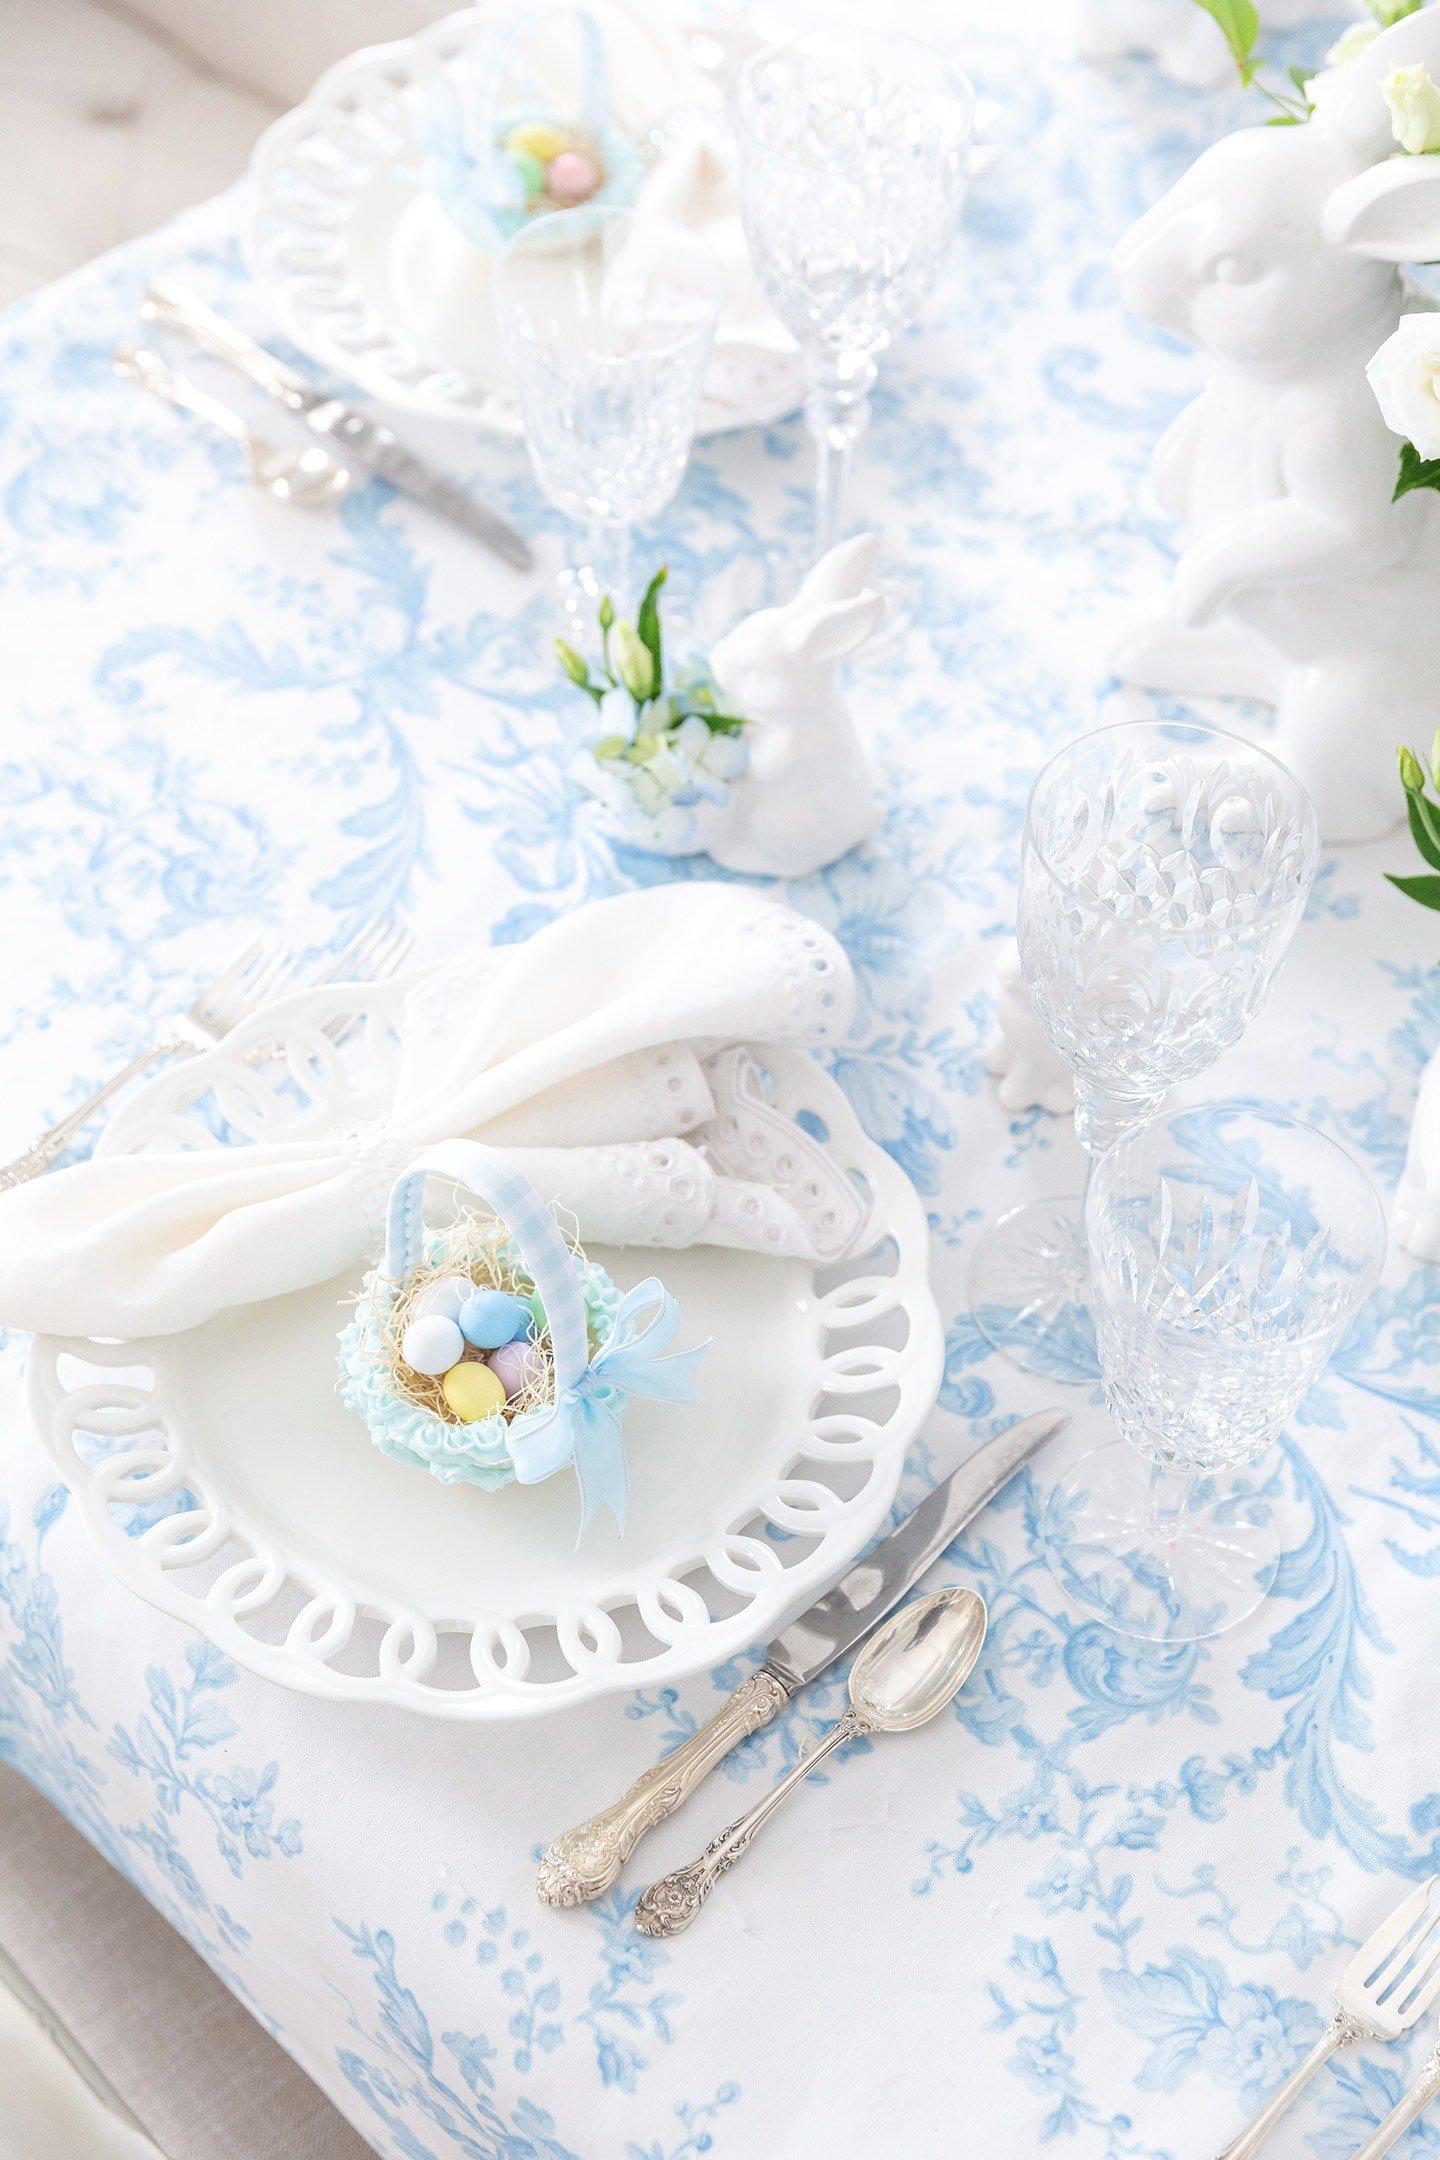 White lattice Easter place setting